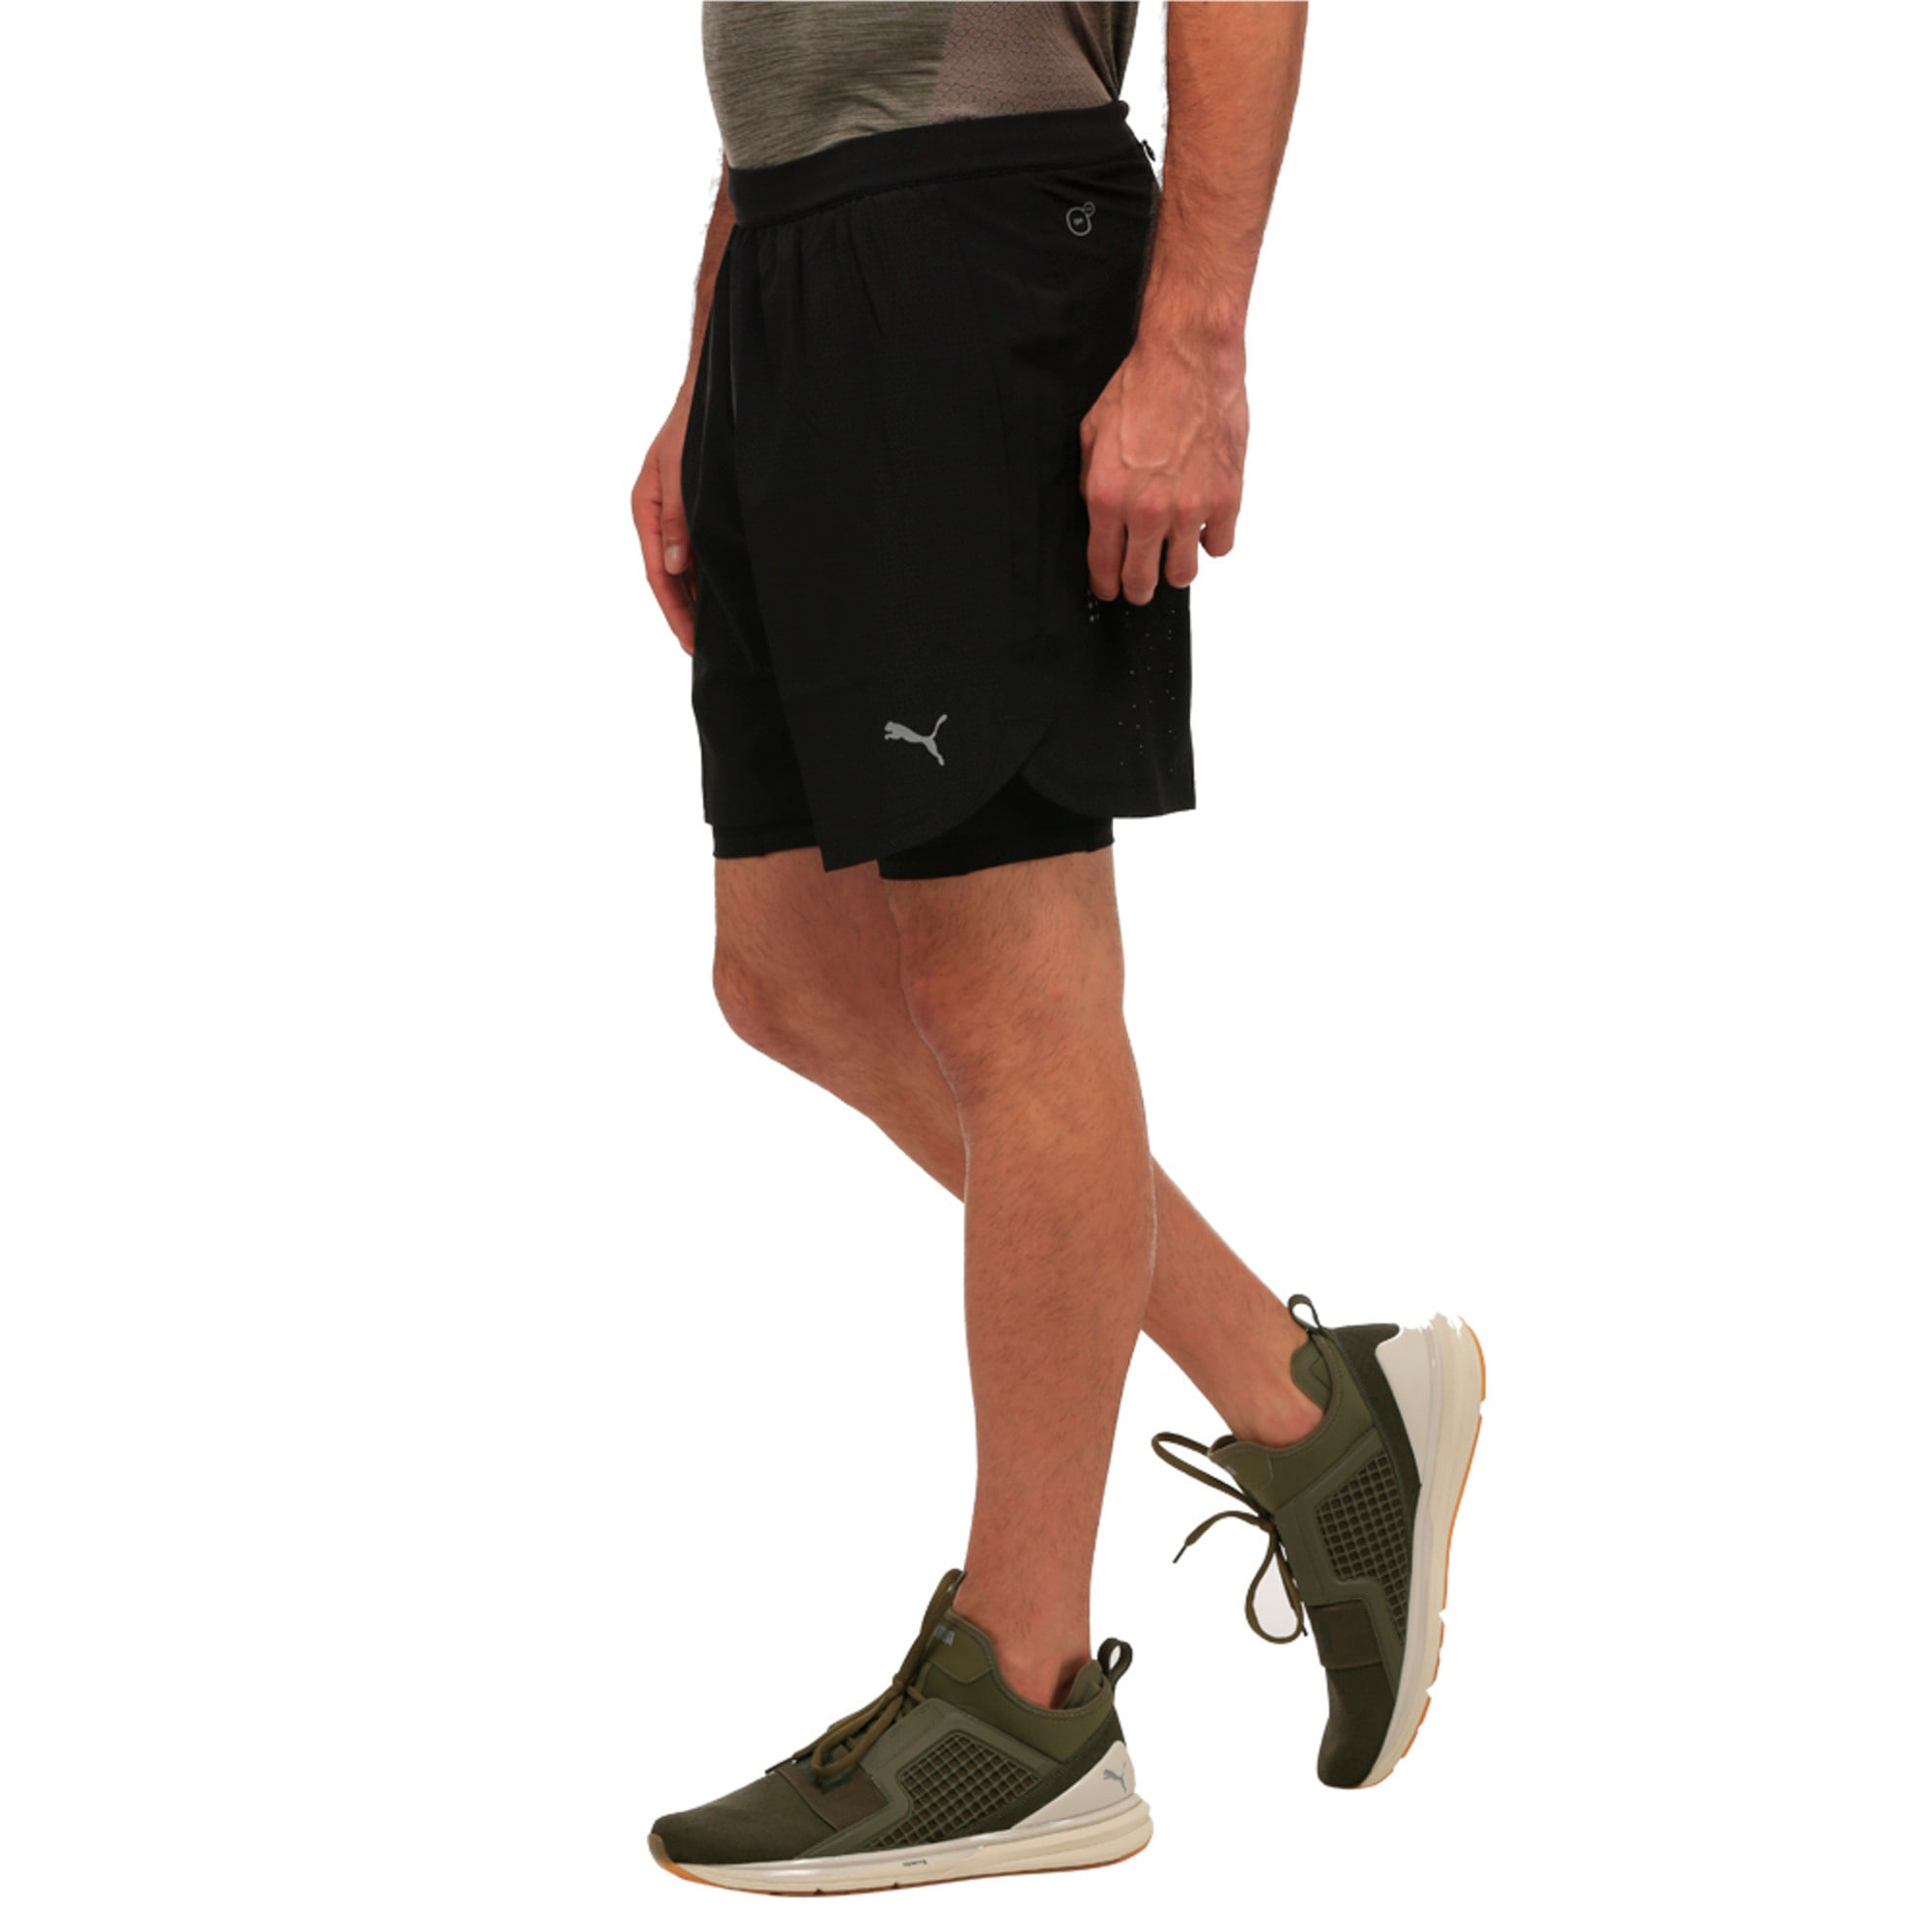 Thumbnail 3 of Running Men's Pace 2 in 1 Shorts, Puma Black, medium-IND